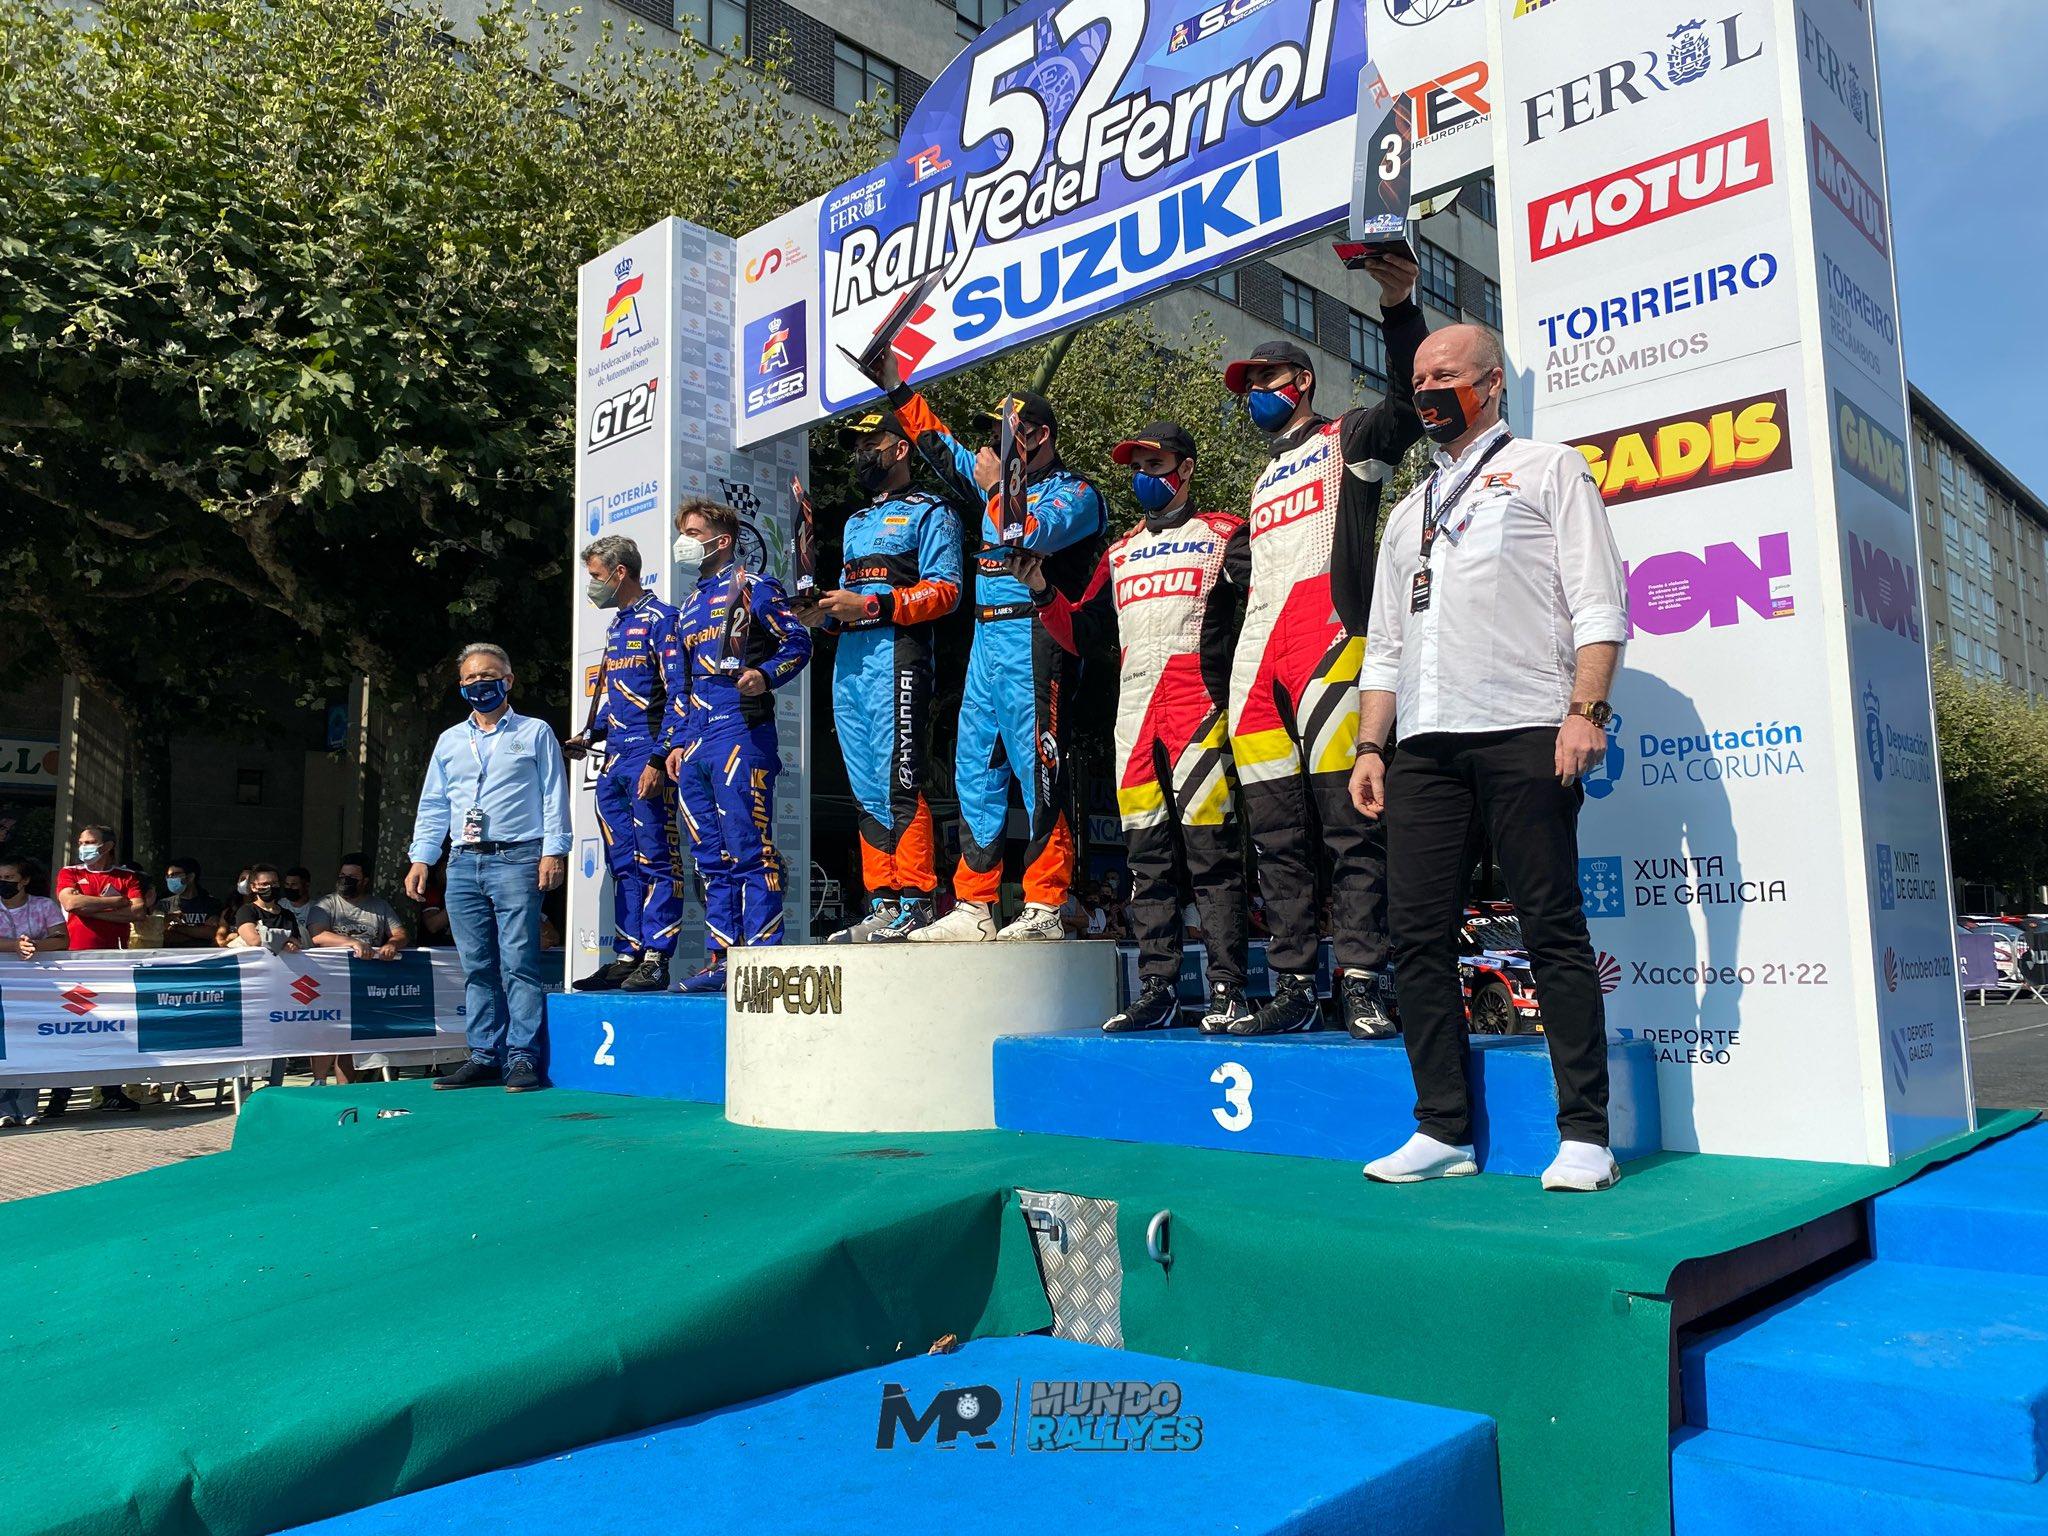 SCER + TER: 52º Rallye de Ferrol - Suzuki [20-21 Agosto] - Página 2 E9U9n8eXEAQy7Dr?format=jpg&name=large